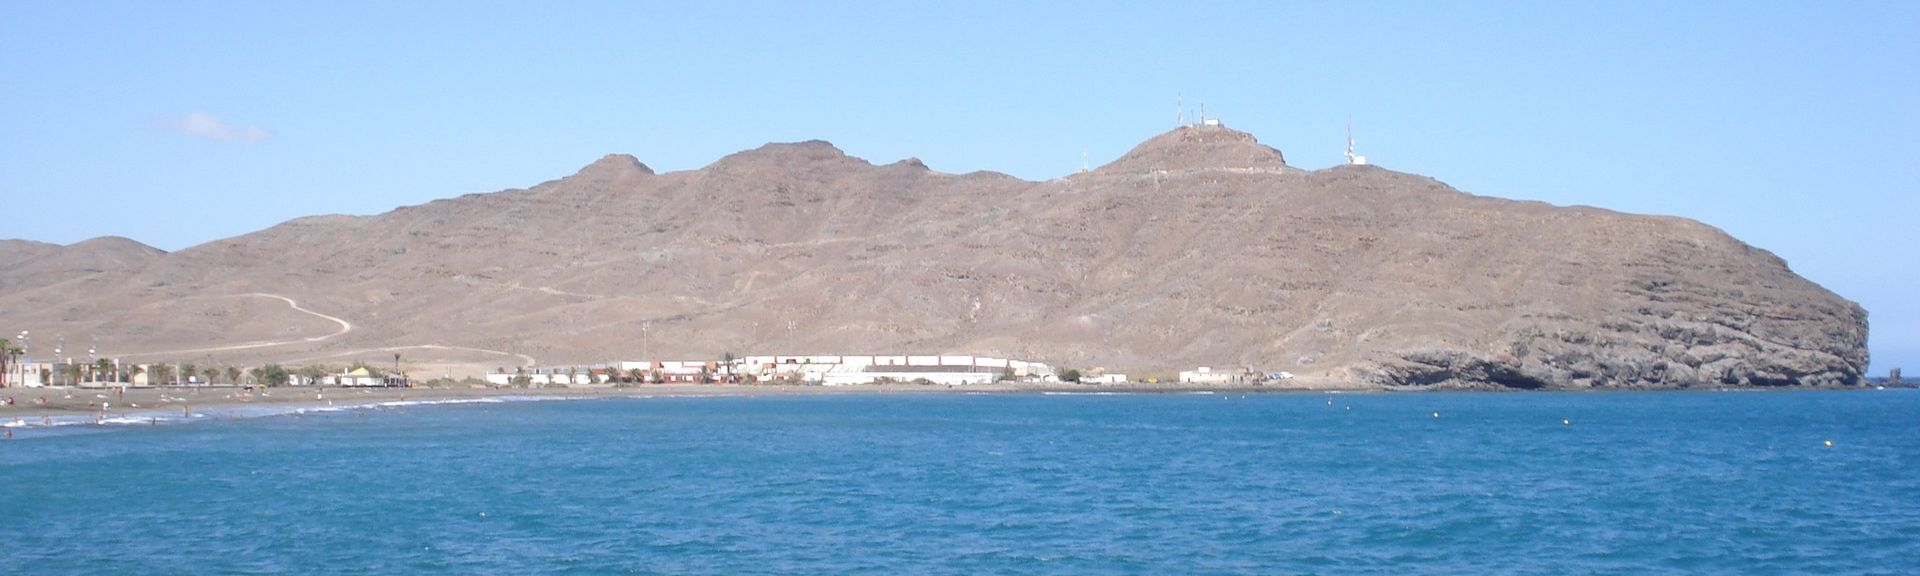 Golfbaan Fuerteventura, Canarische Eilanden, Spanje